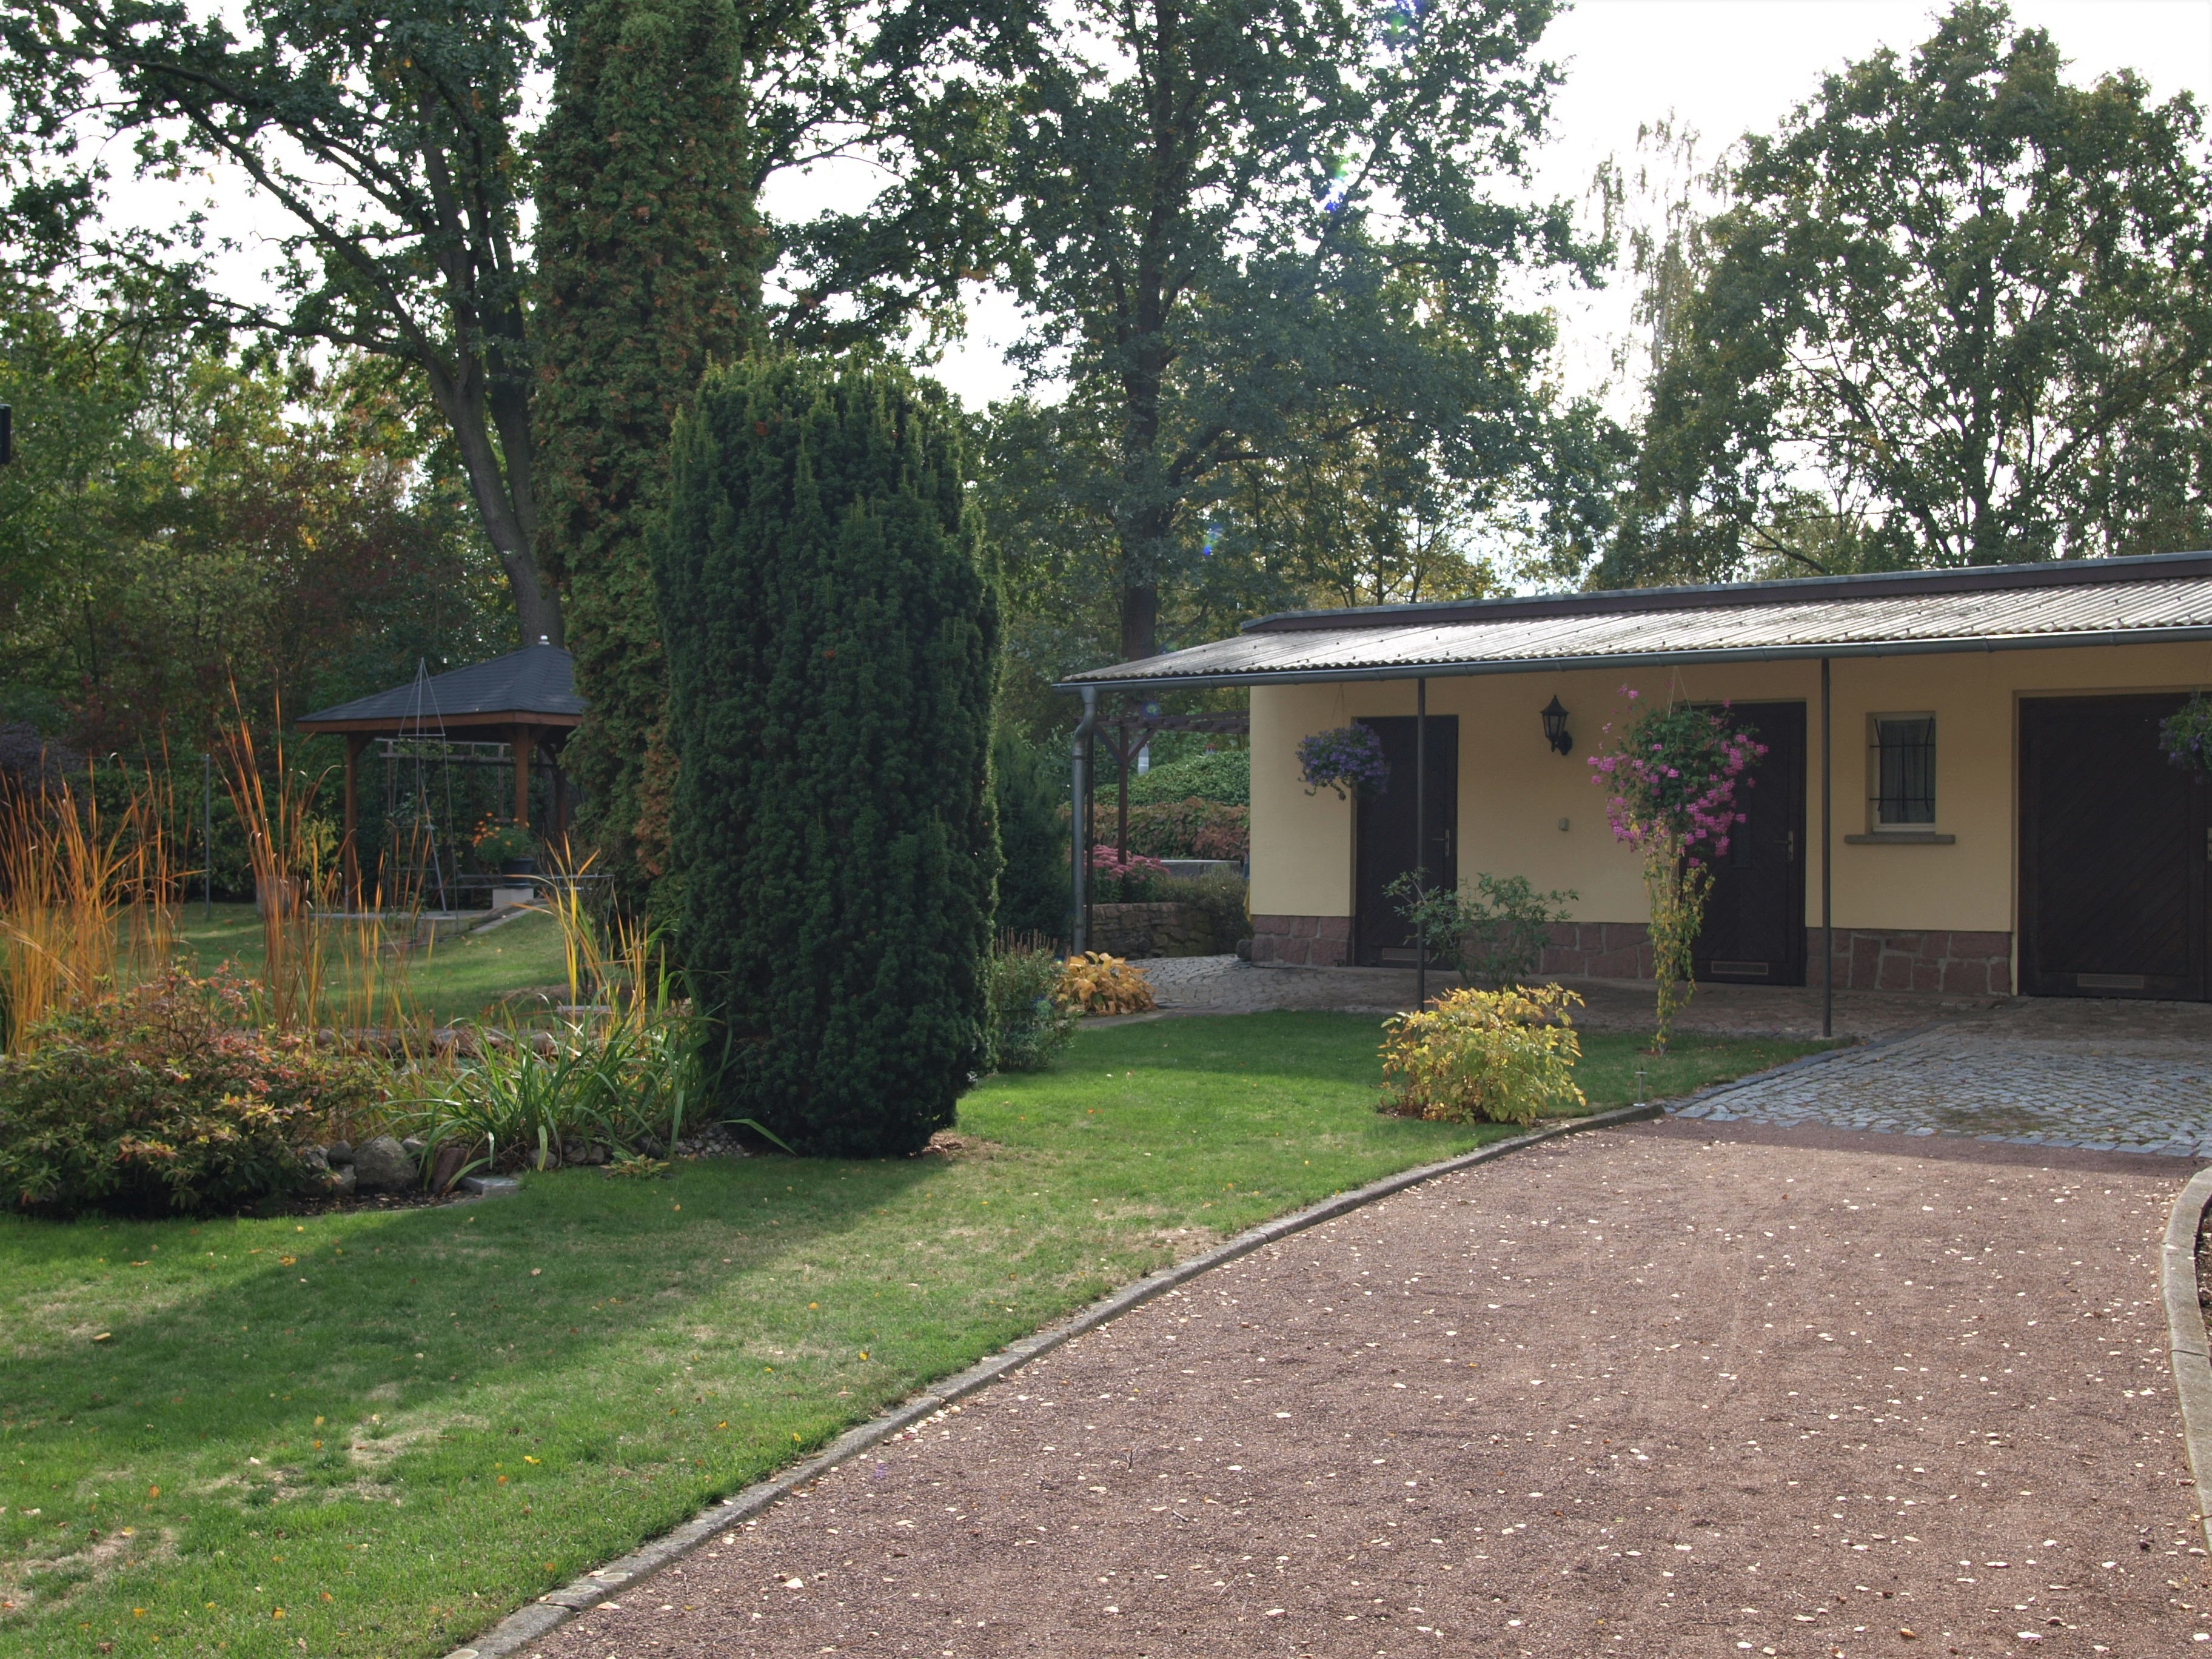 Einfamilienhaus Kröllwitz - Nebengelass